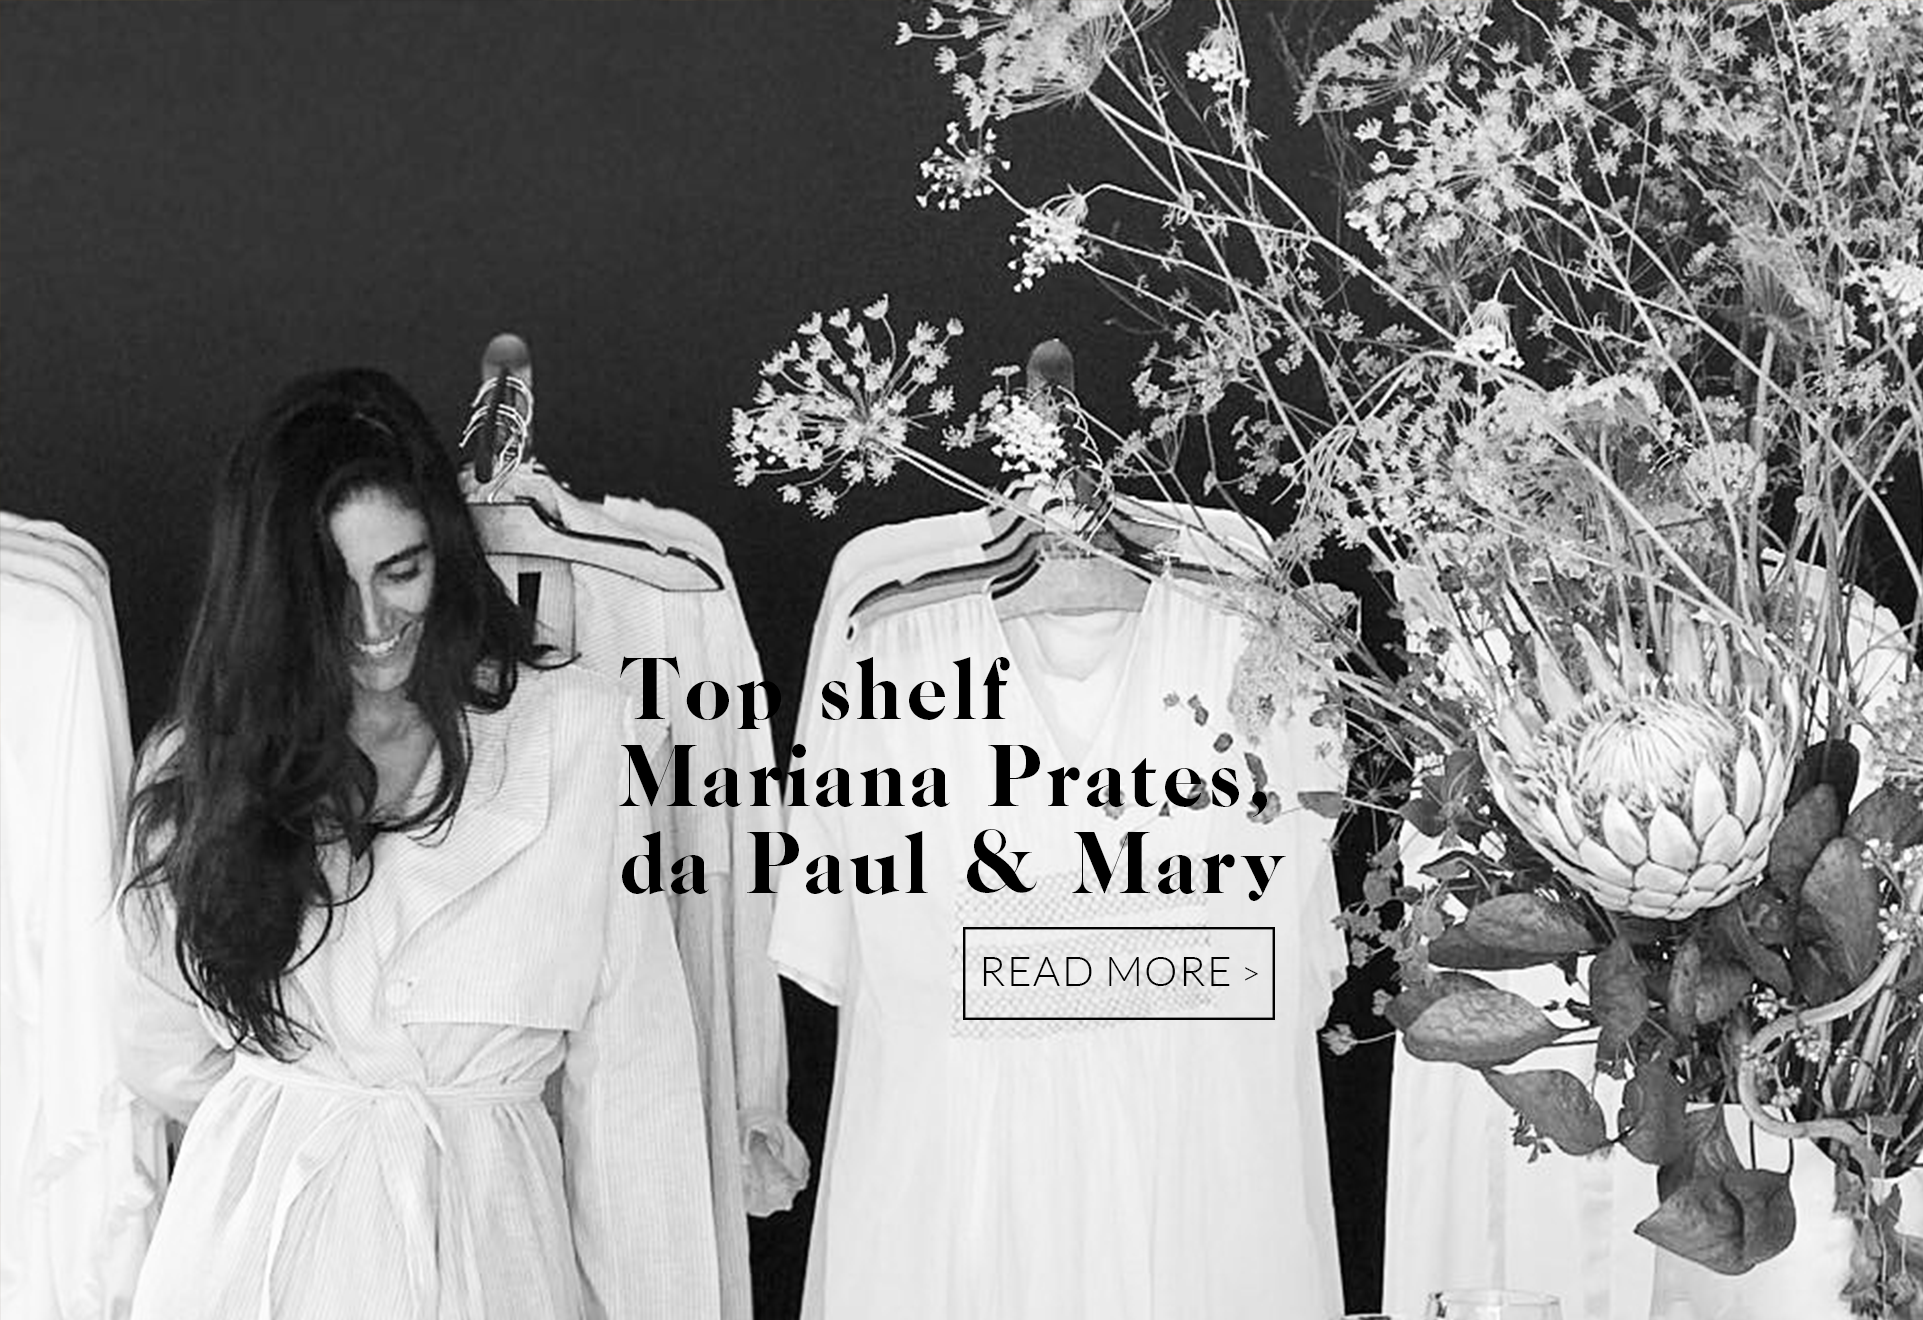 mari prates top shelf lolla 2 - A Beauty Routine da Mariana Prates, founder da Paul & Mary